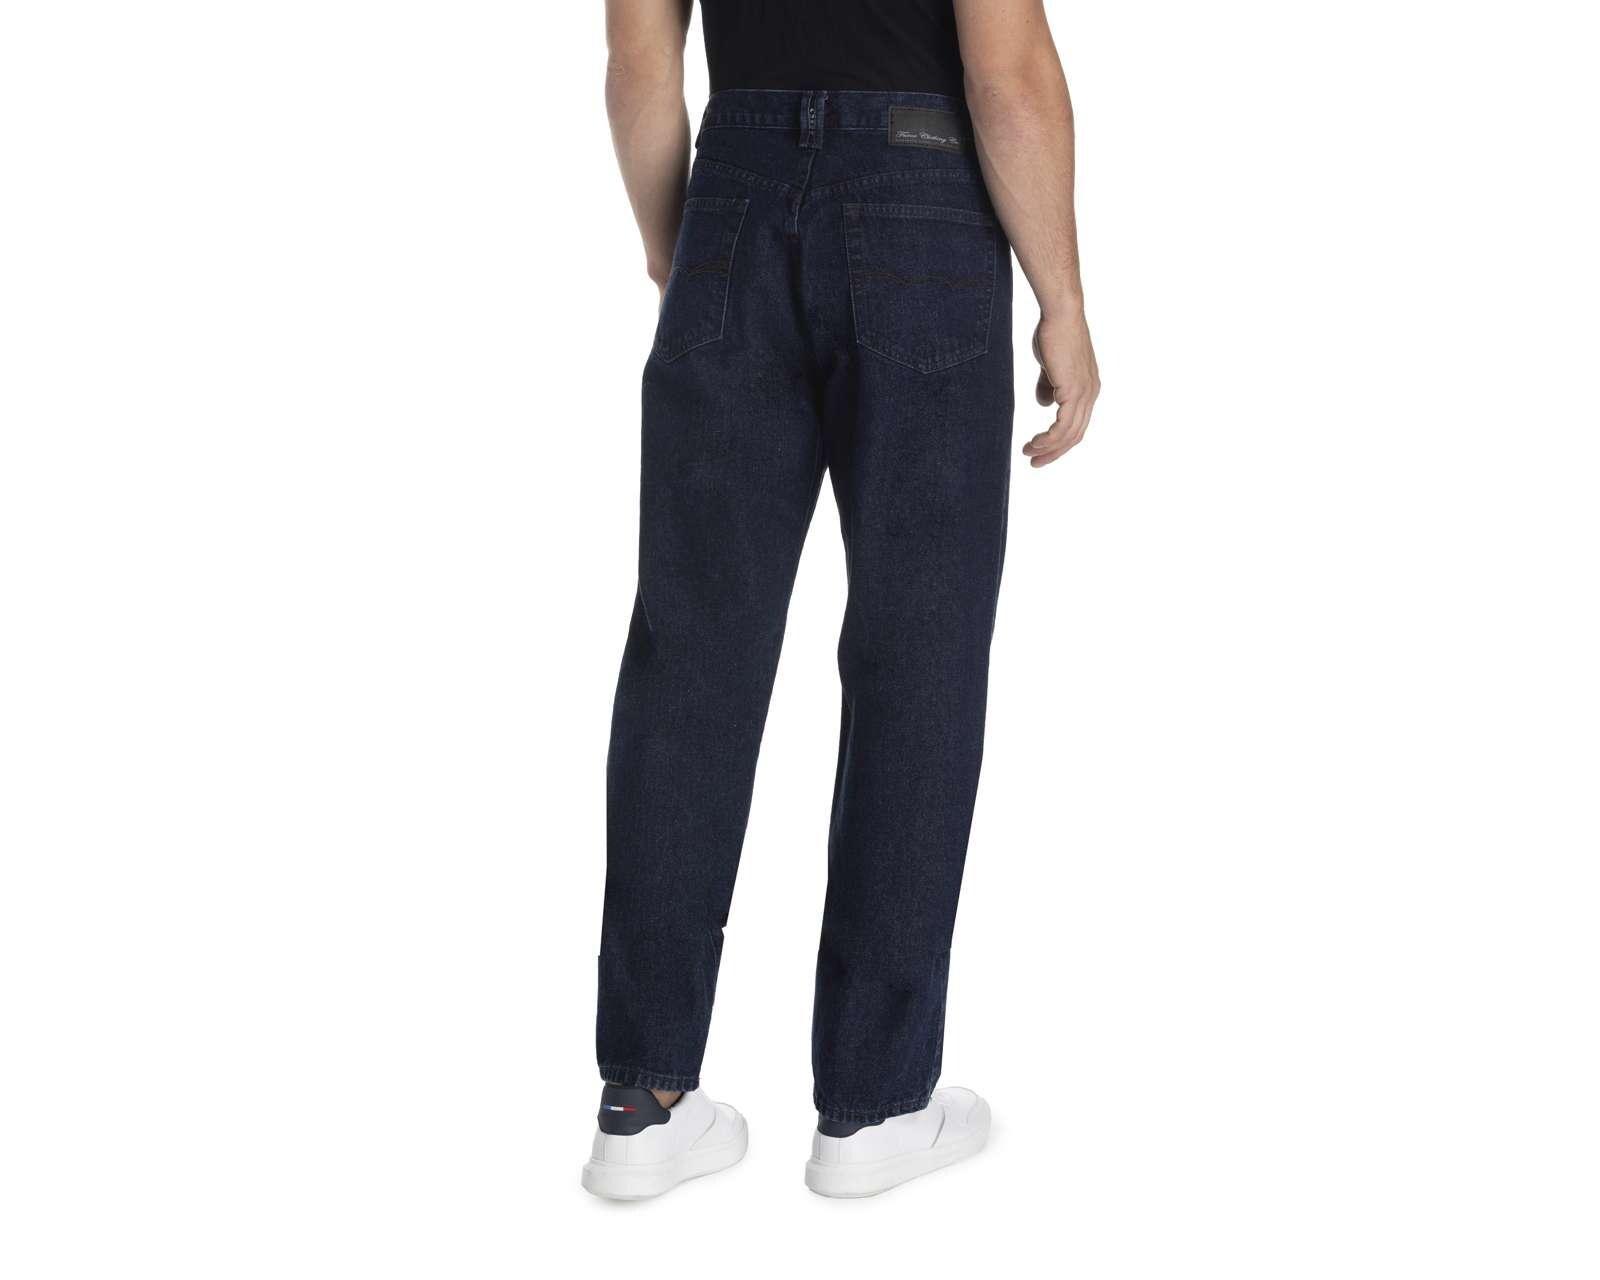 Jeans Furor Regular Fit Largo 32 1217702 Coppel